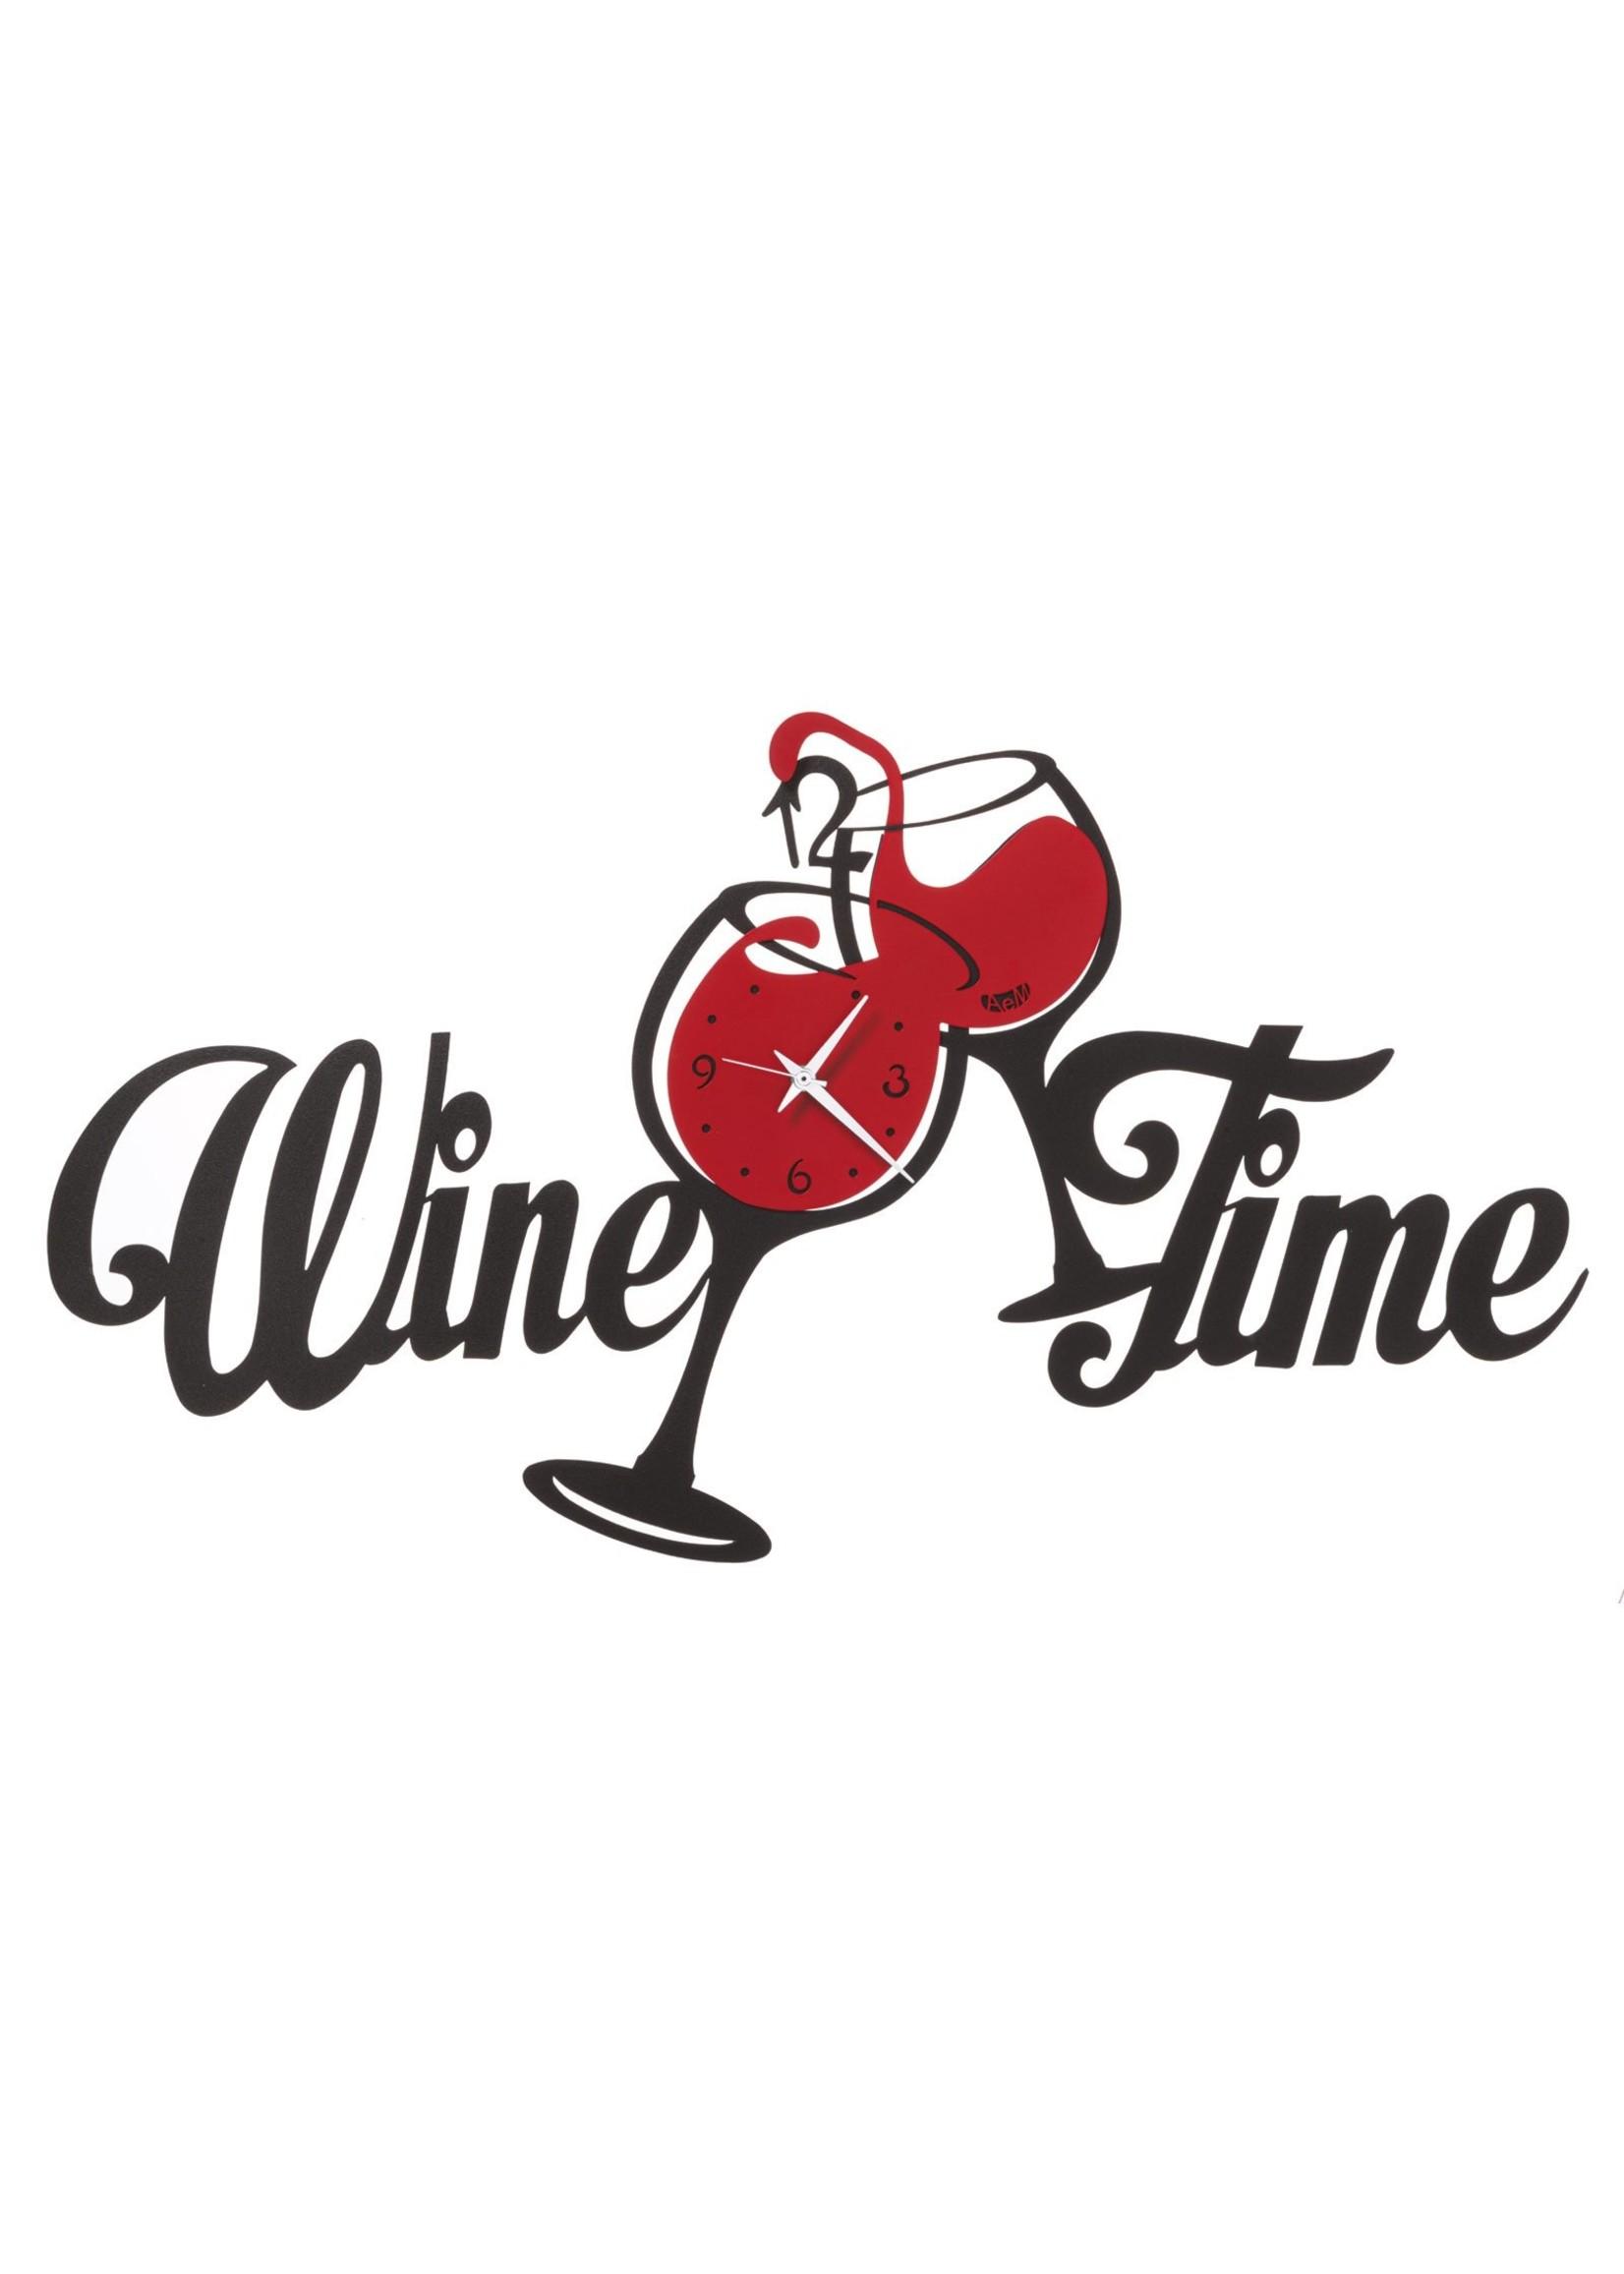 Arti & Mestieri Wandklok Italiaans Design Wine Time 3409 c192 black/red